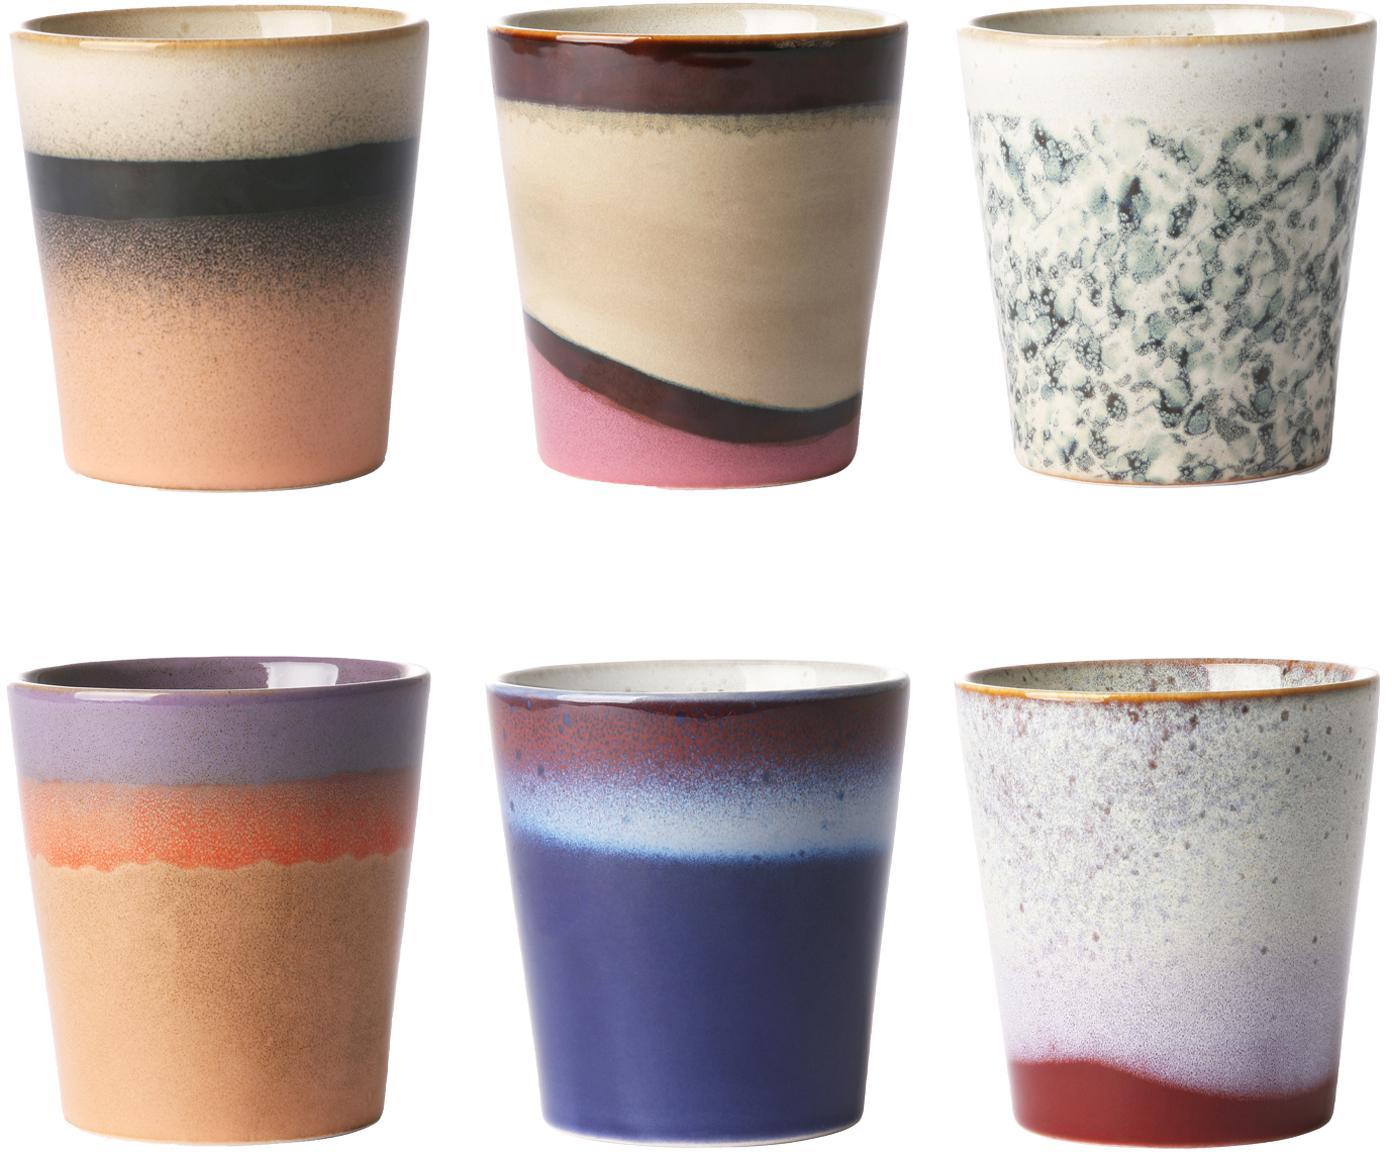 Handgemachtes XS Becher-Set 70's, 6-tlg., Keramik, Mehrfarbig, Ø 8 x H 8 cm